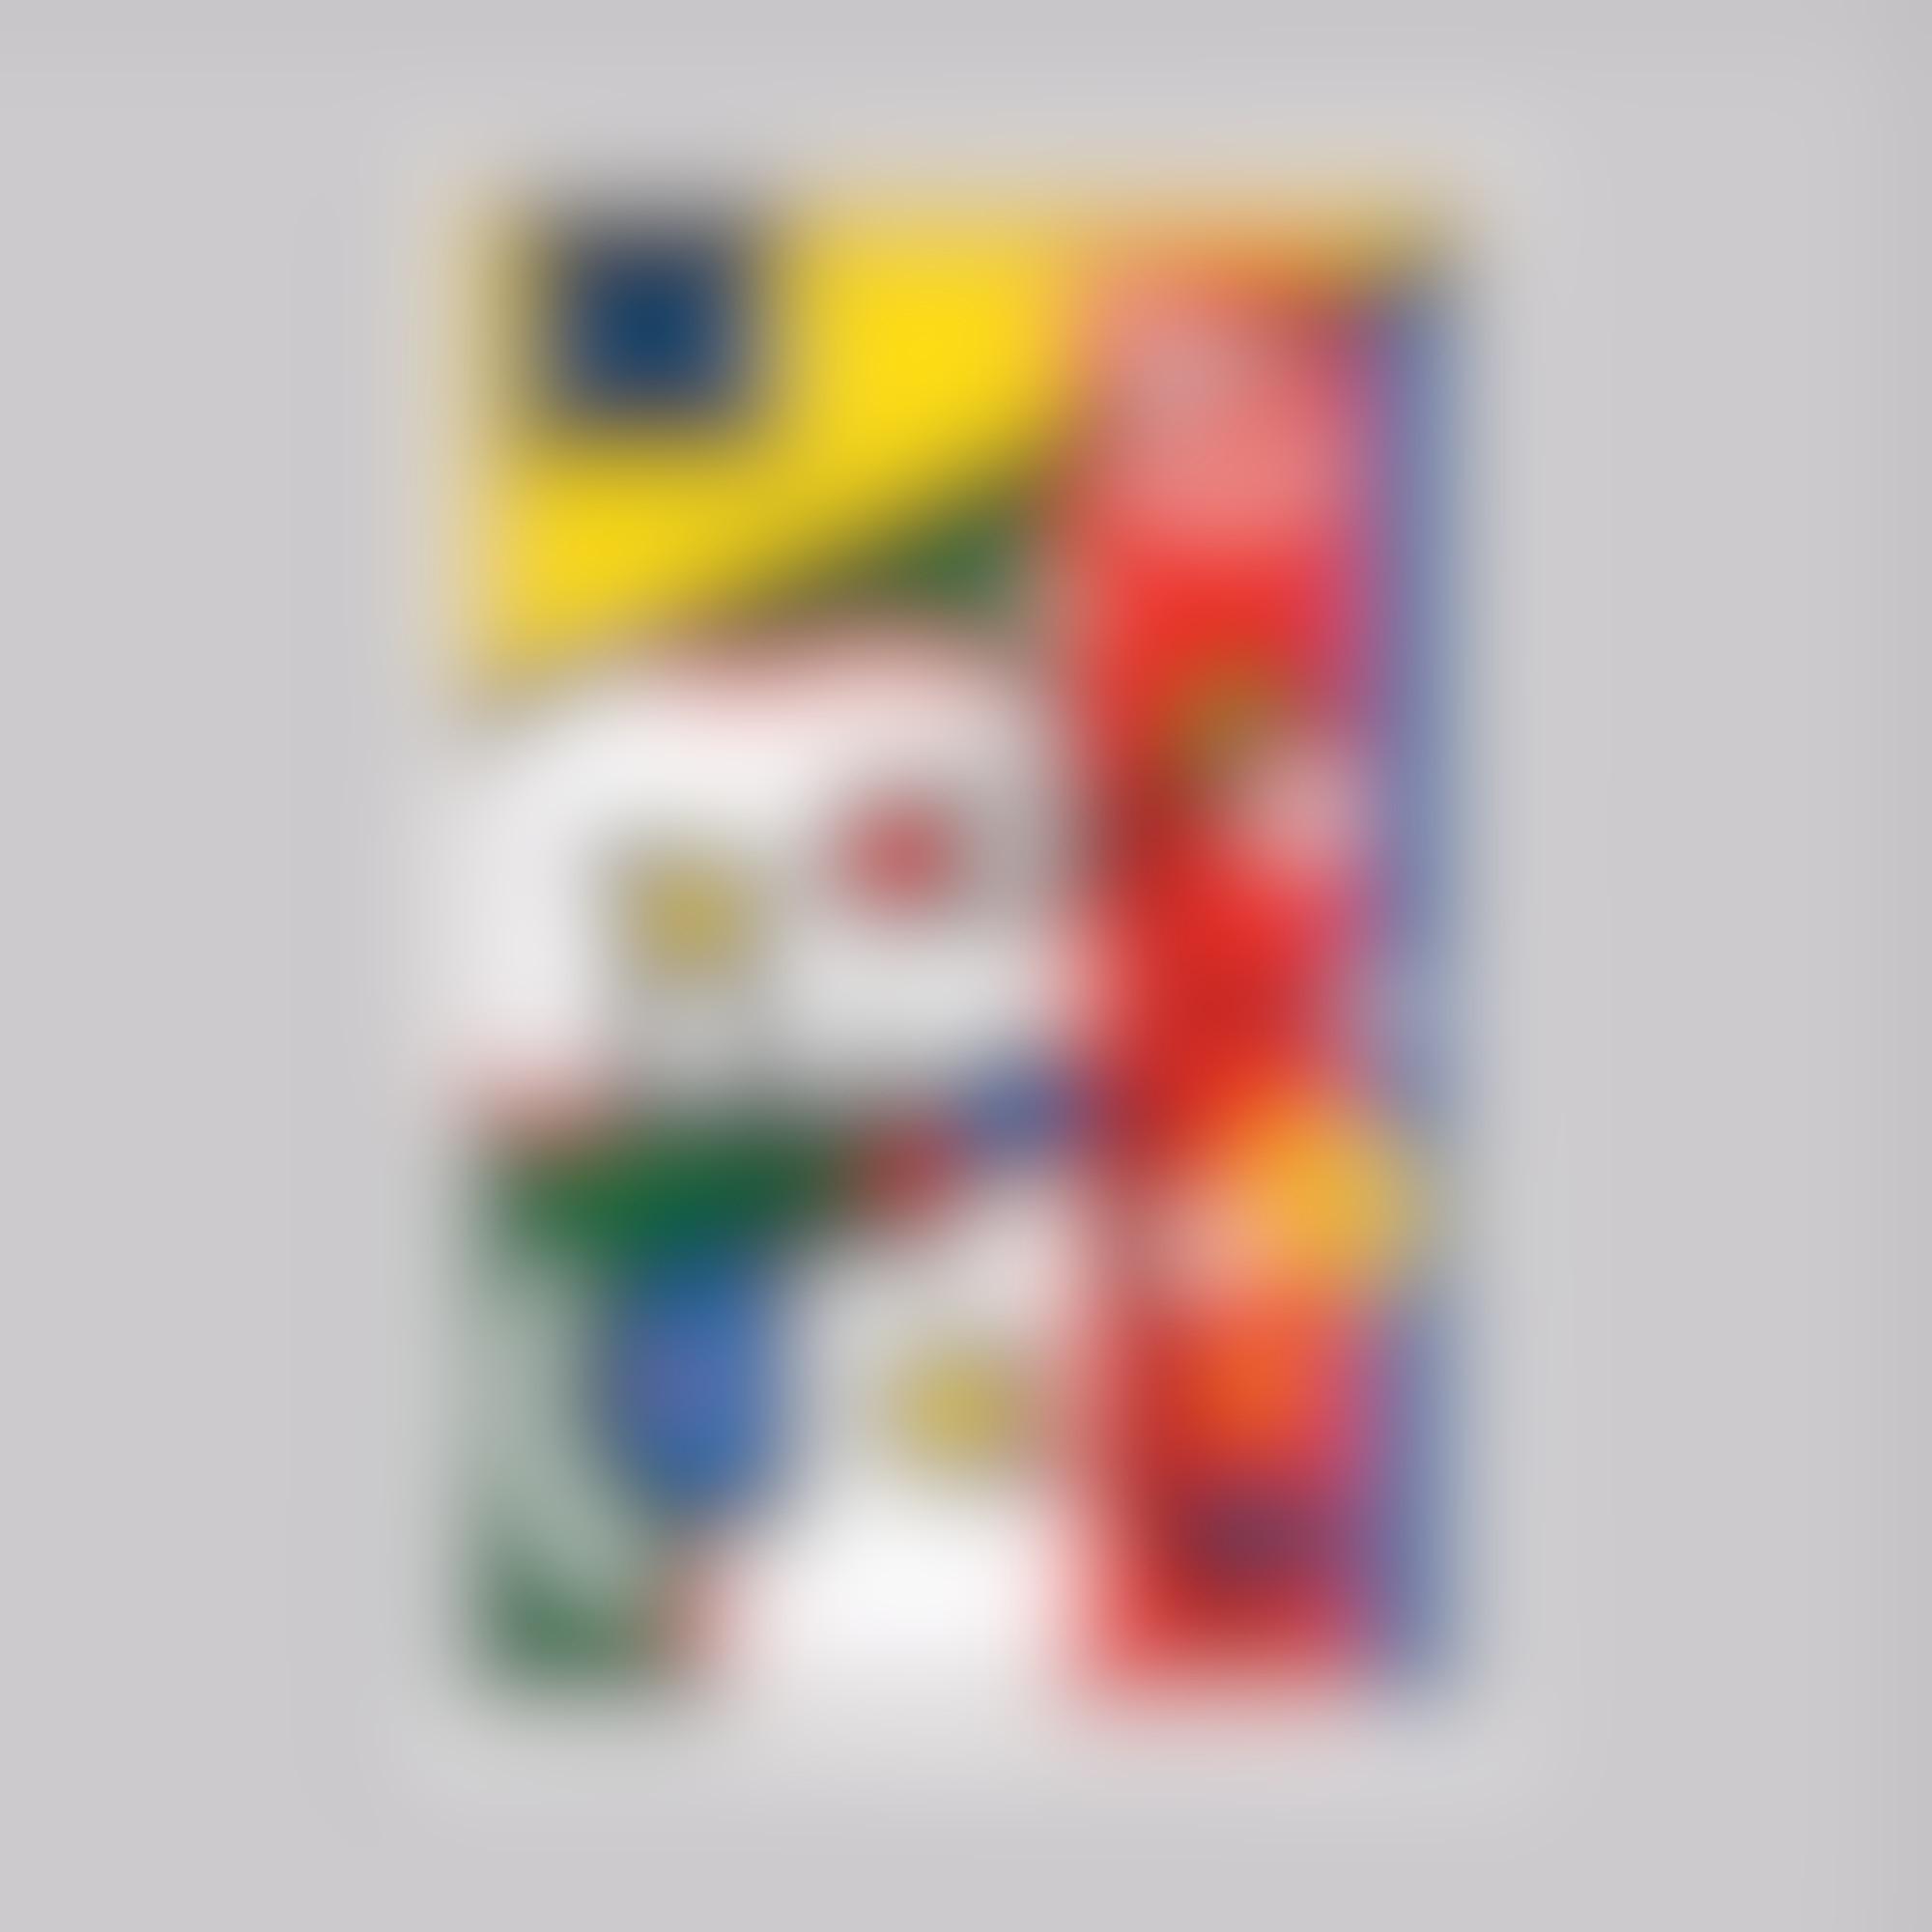 Gabriella Marcella BAKE TO DATE Art Print 2014 autocompressfitresizeixlibphp 1 1 0max h2000max w3 D2000q80s94532b04308fb4528a4feab91aadc0c7